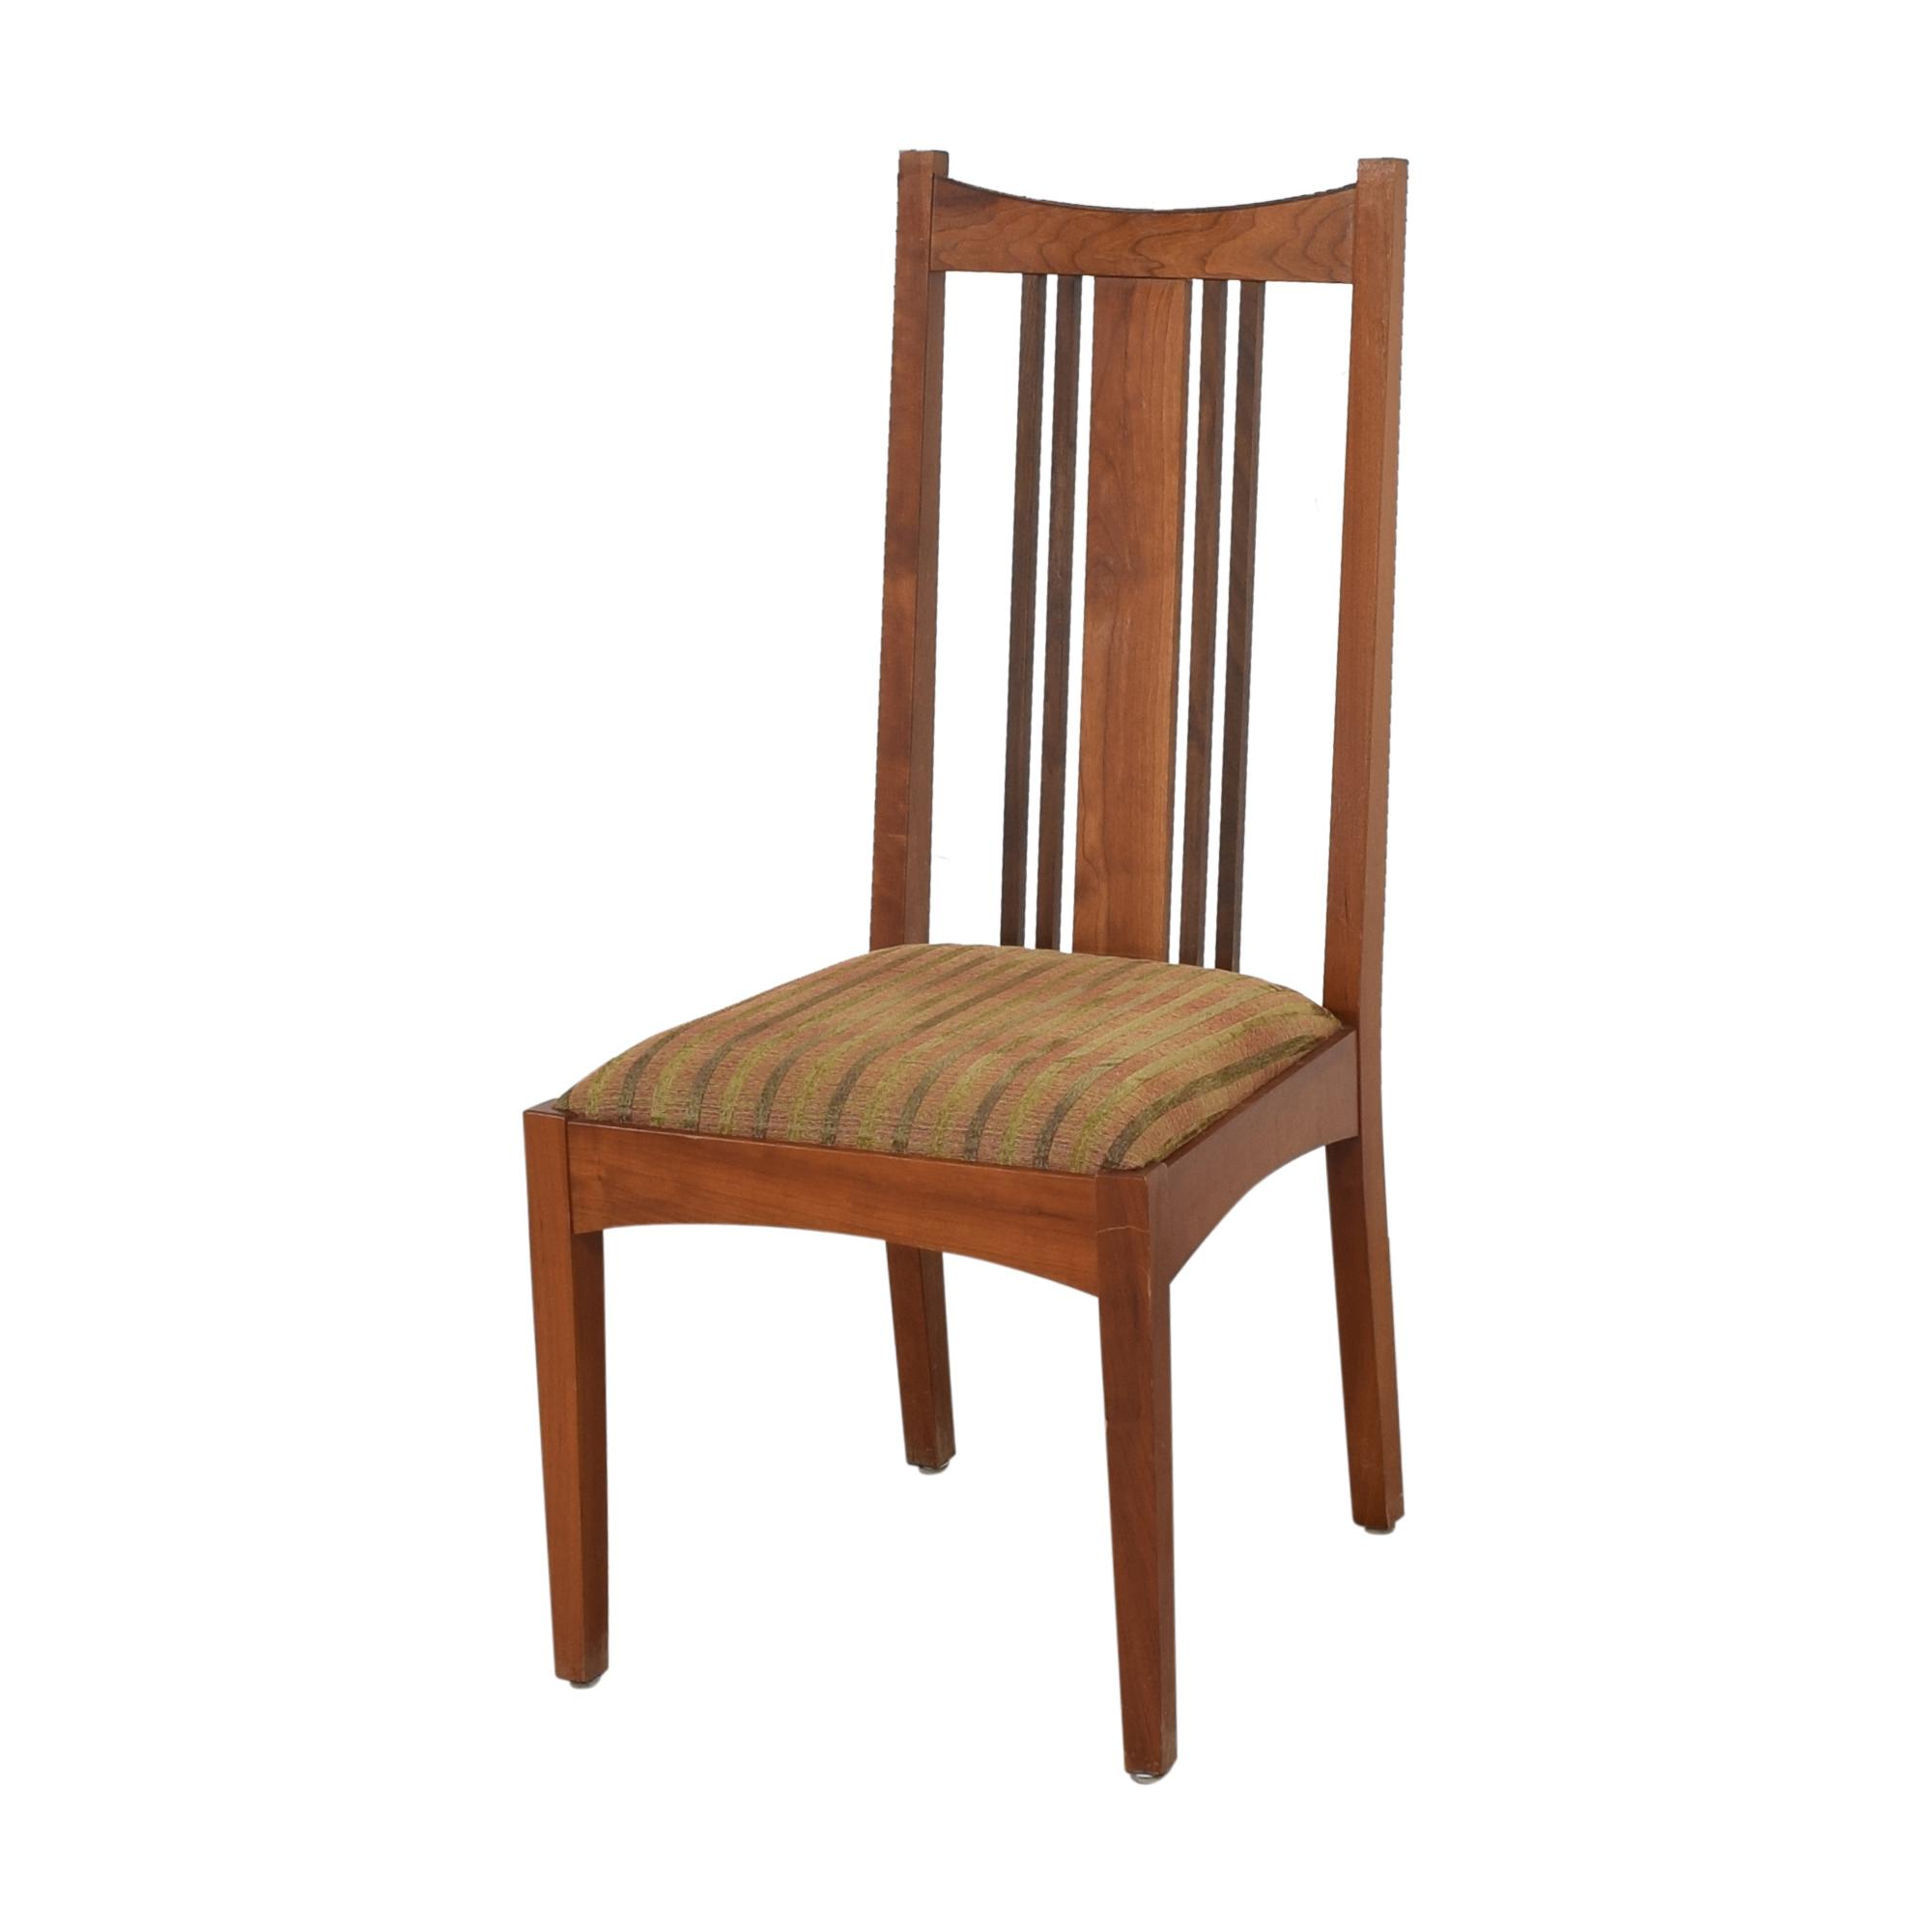 Stickley Furniture Metropolitan Side Chair / Chairs